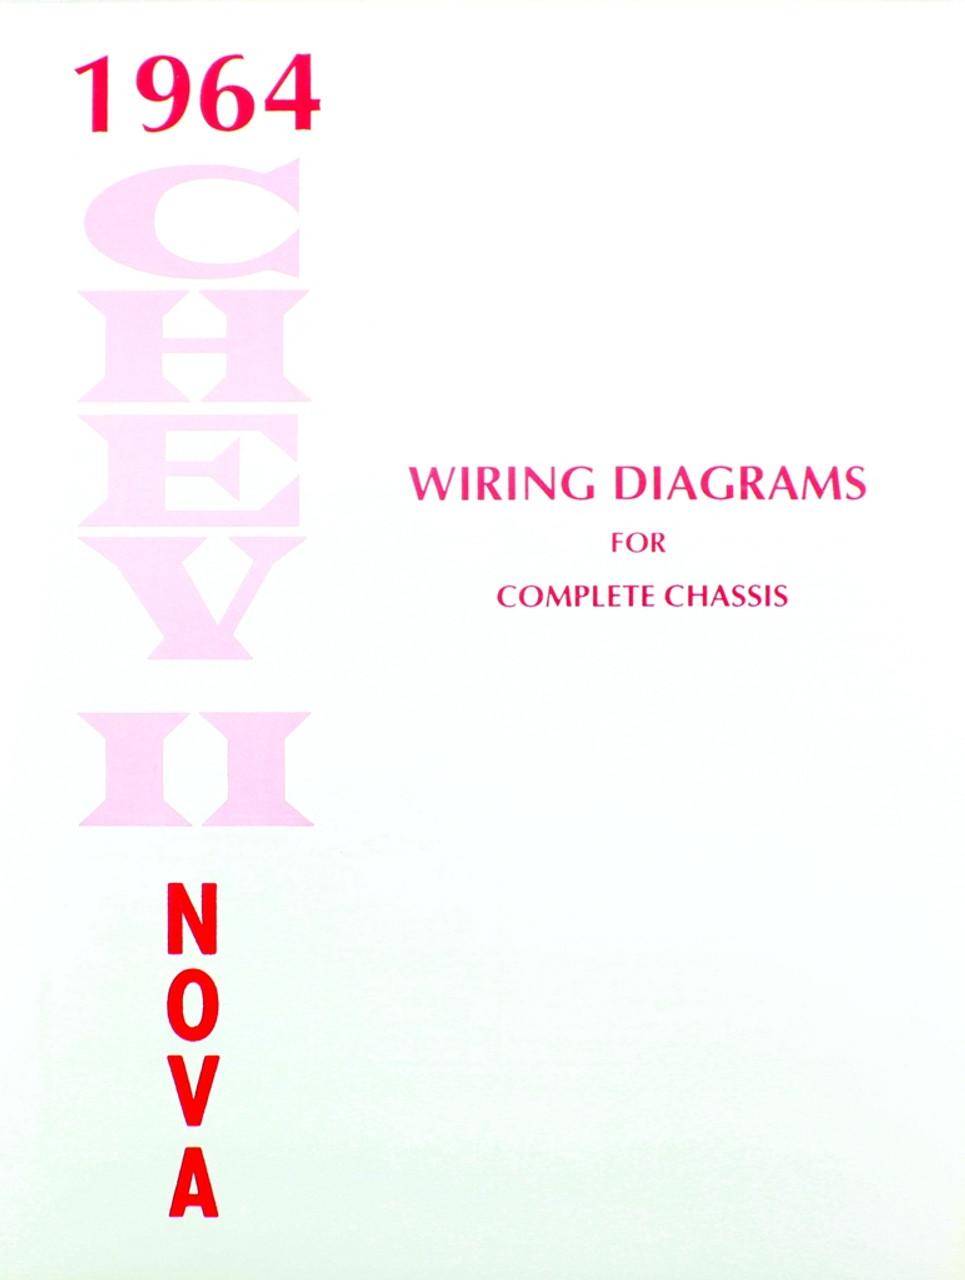 1964 Nova Wiring Diagram Archive Of Automotive Jaguar 64 Chevy Electrical Manual I 5 Classic Rh I5chevy Com